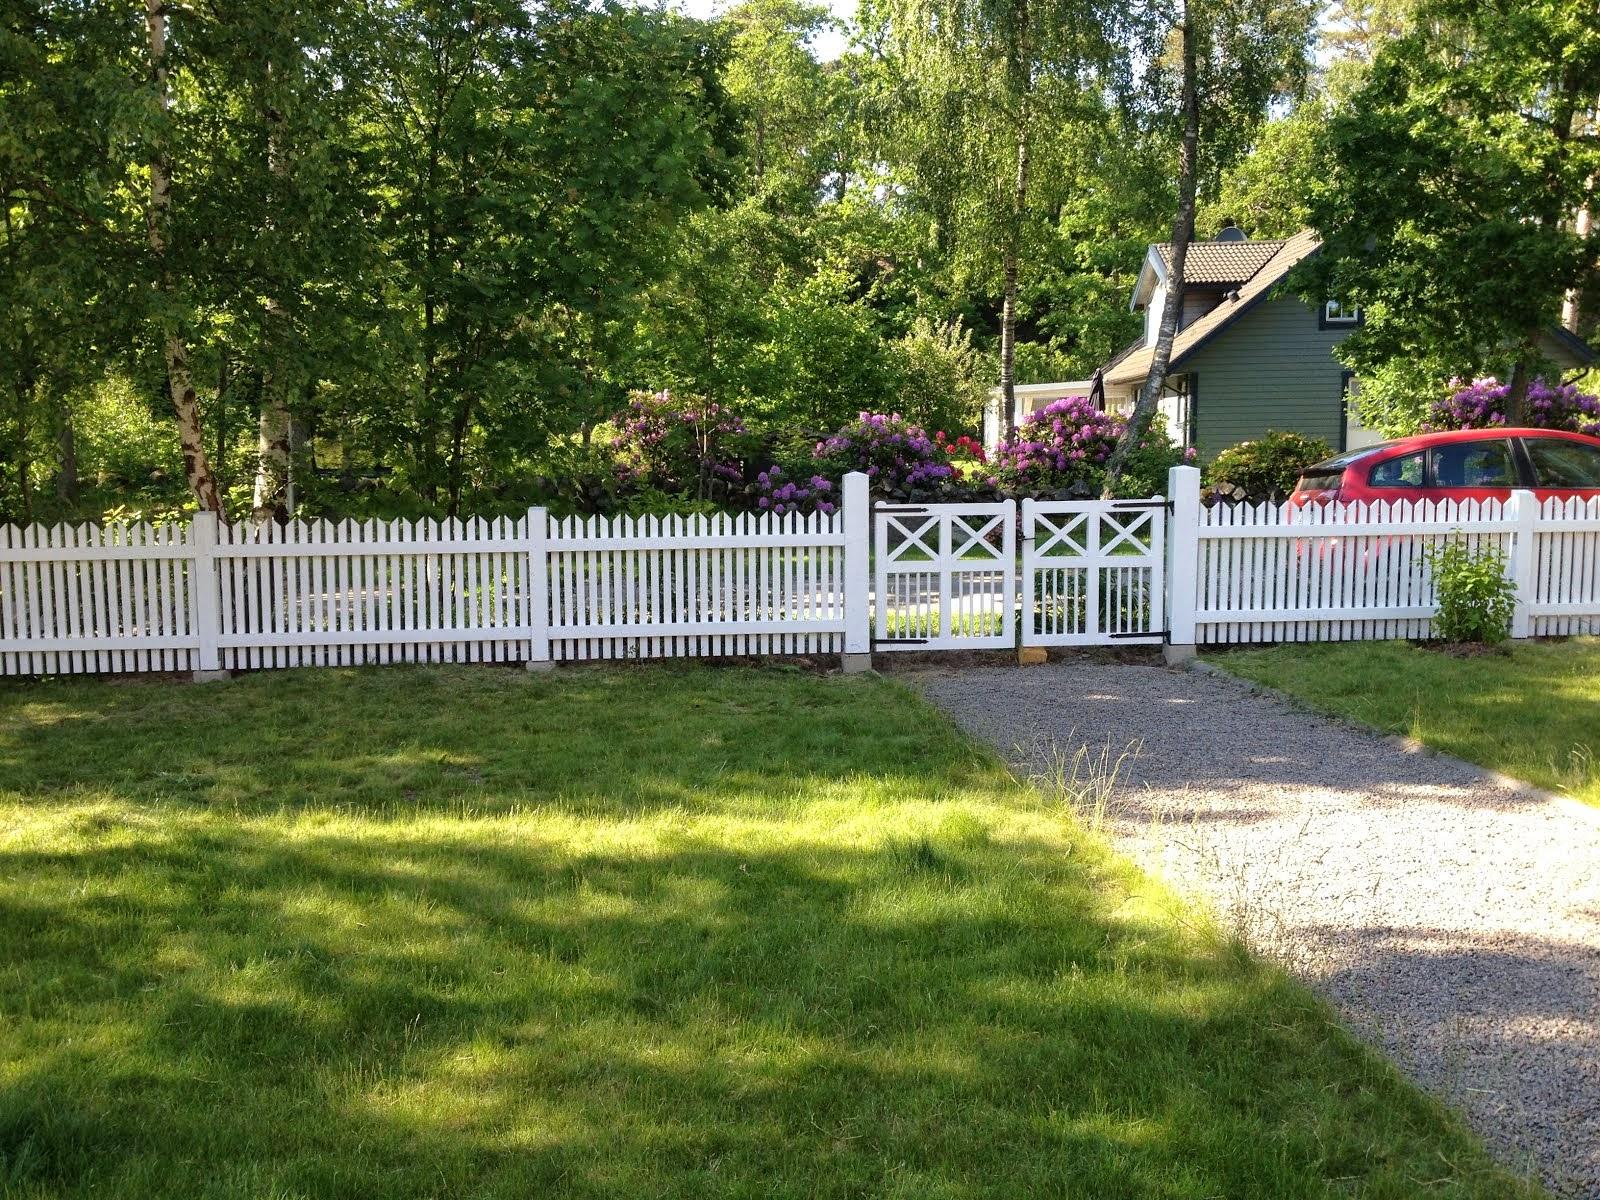 Färdigt staket & grindar sommaren 2014